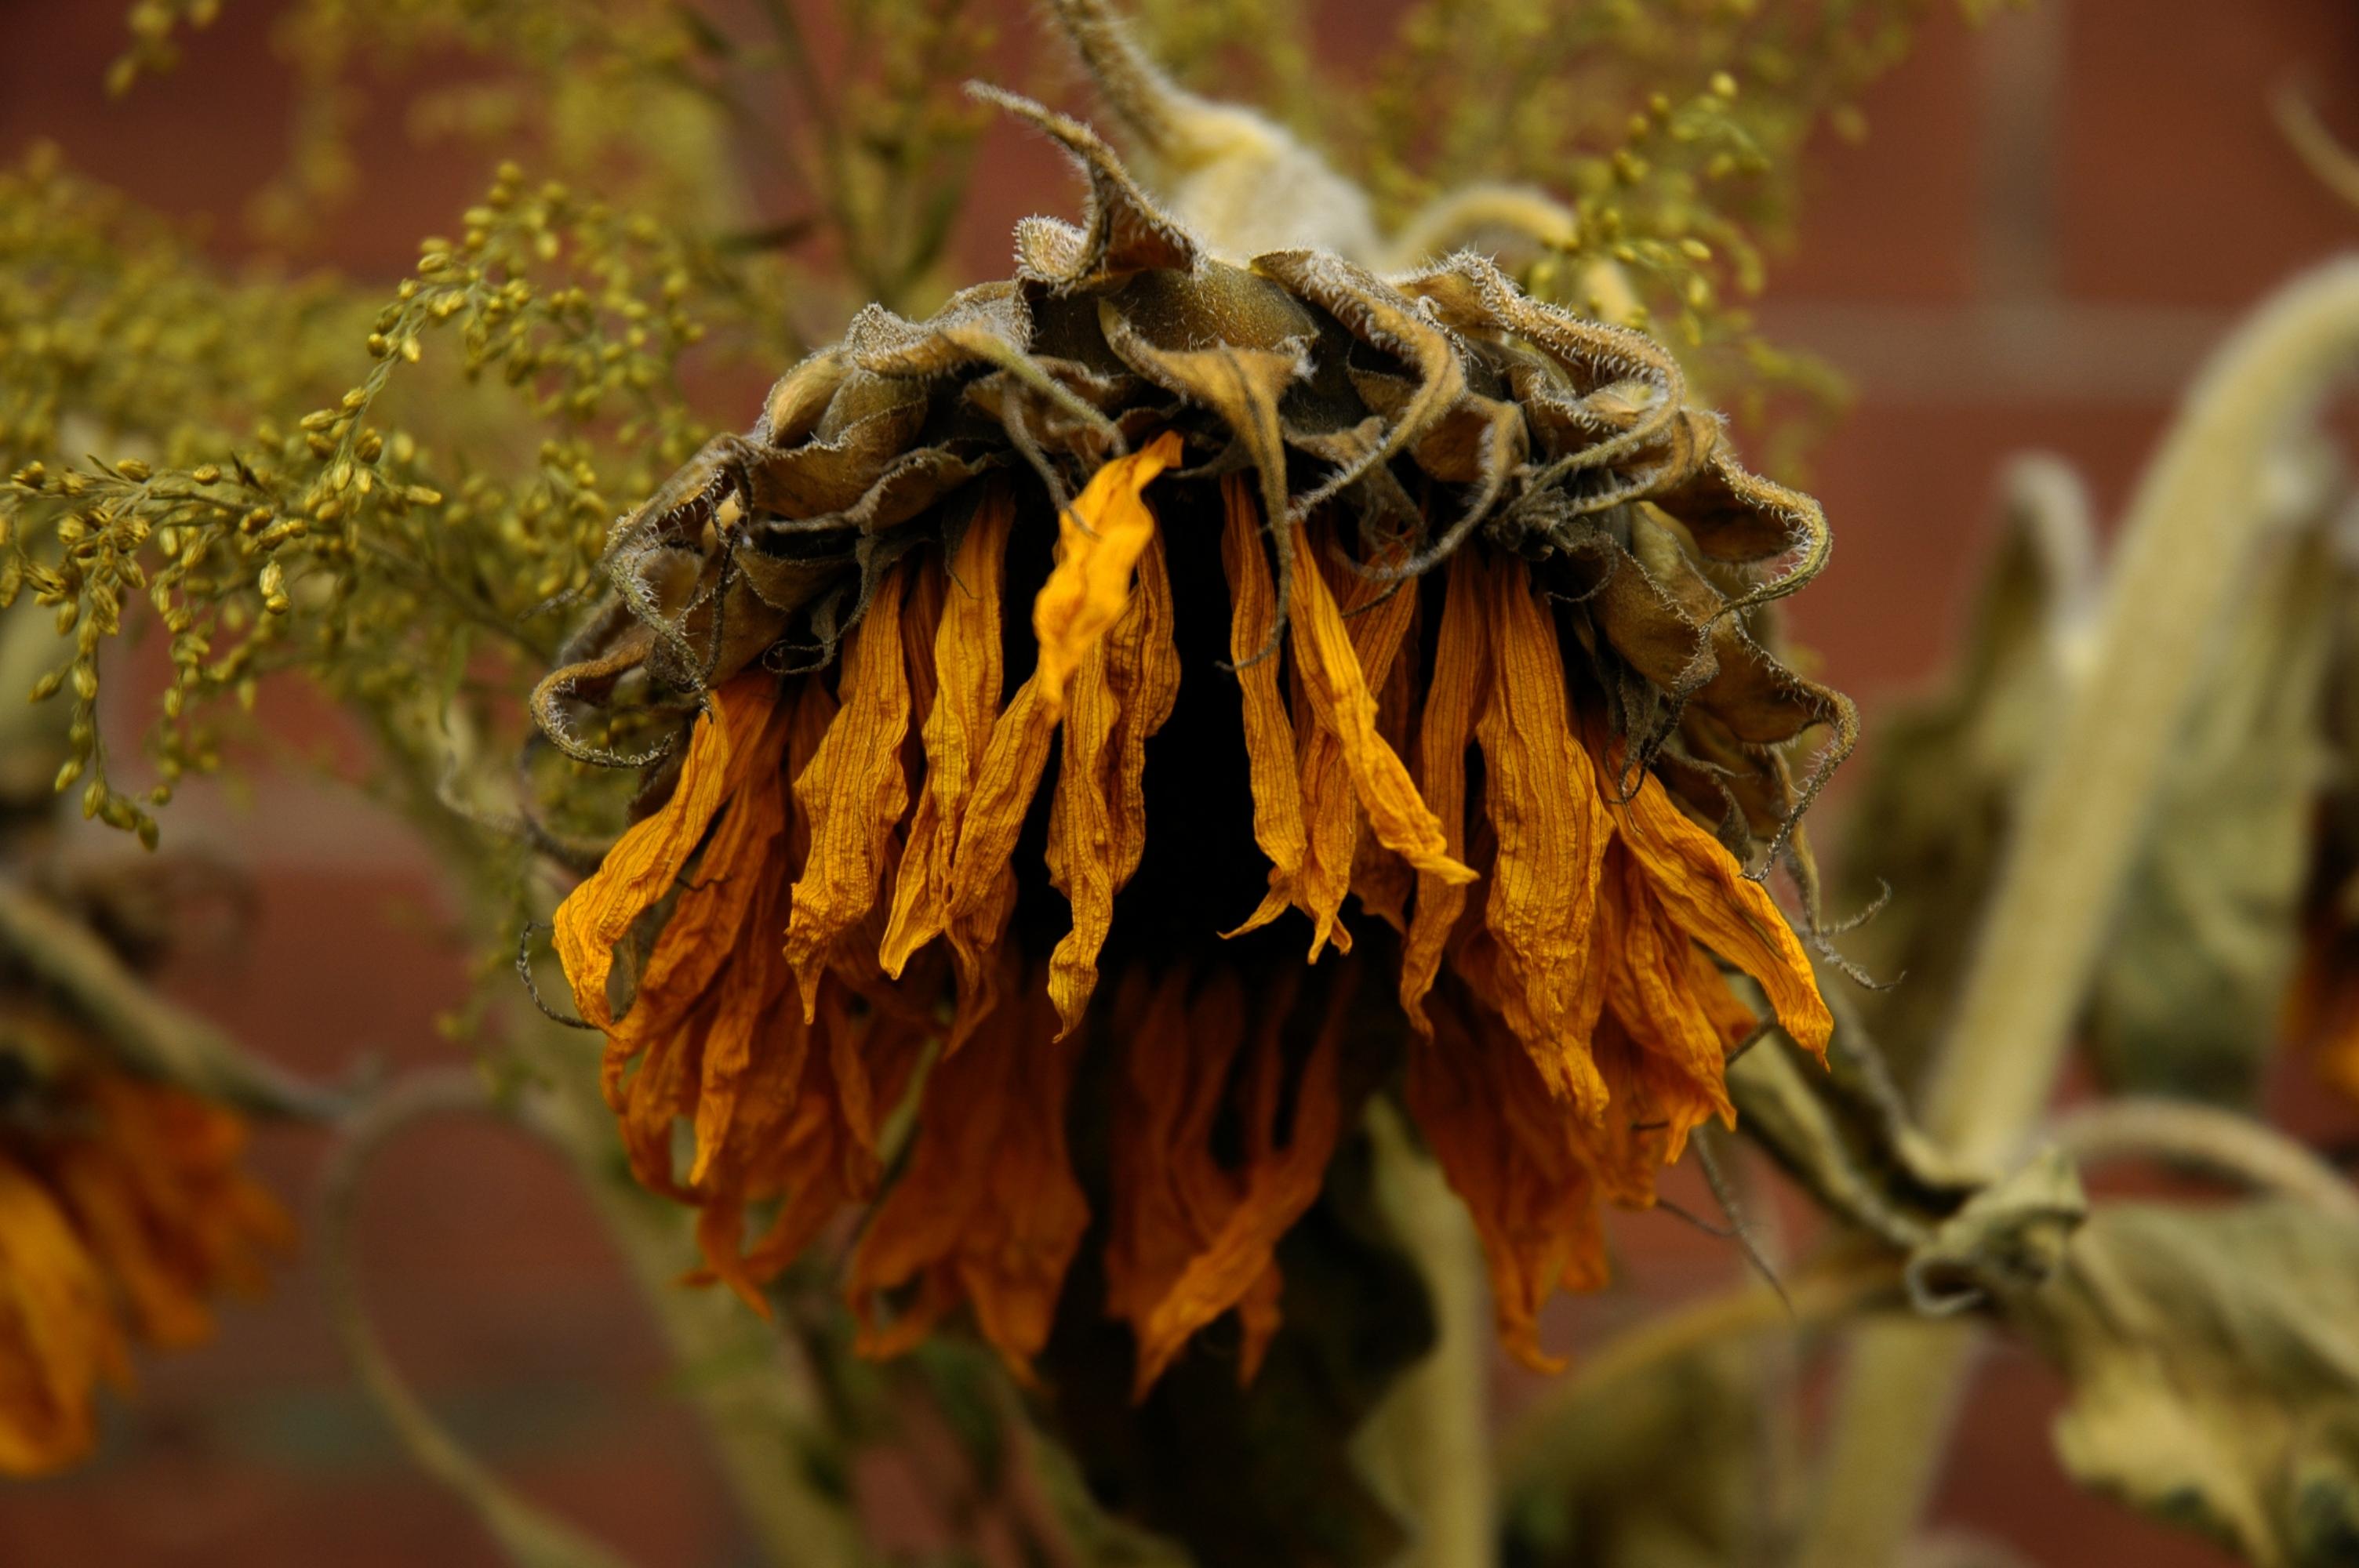 photo of a dead sunflower